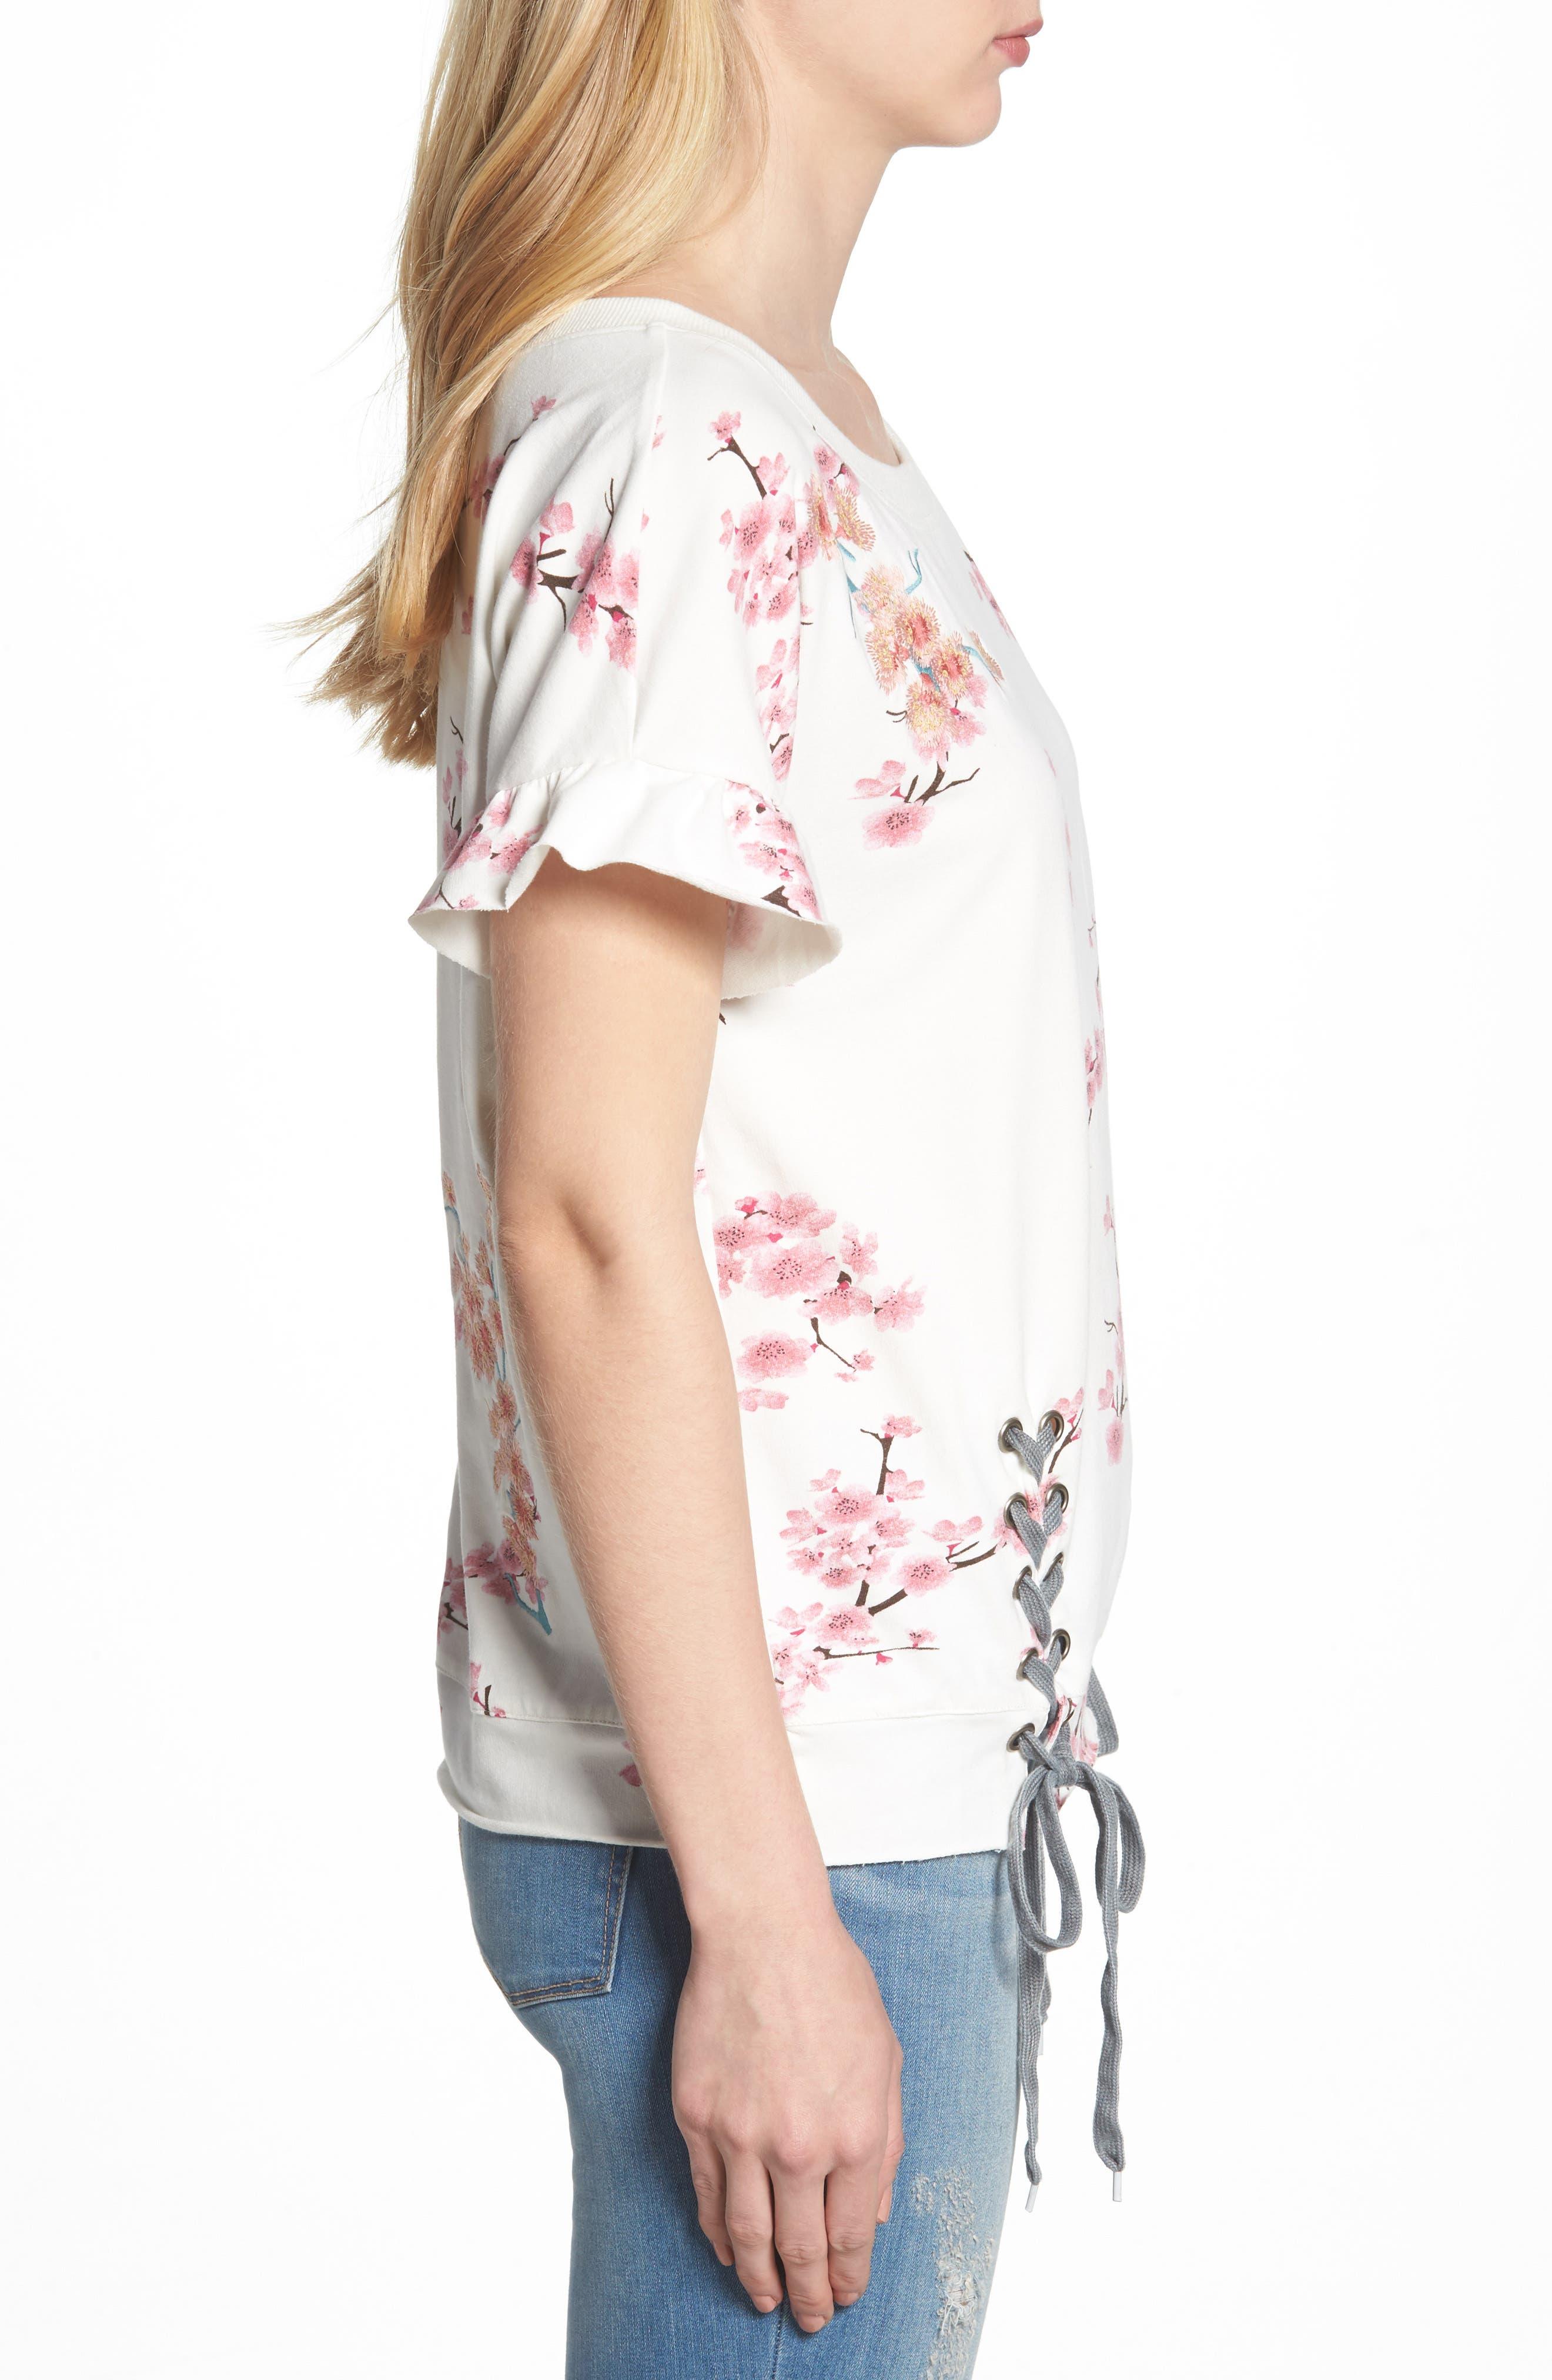 Short Sleeve Lace Up Cherry Blossom Sweatshirt,                             Alternate thumbnail 3, color,                             White Cherry Blossom